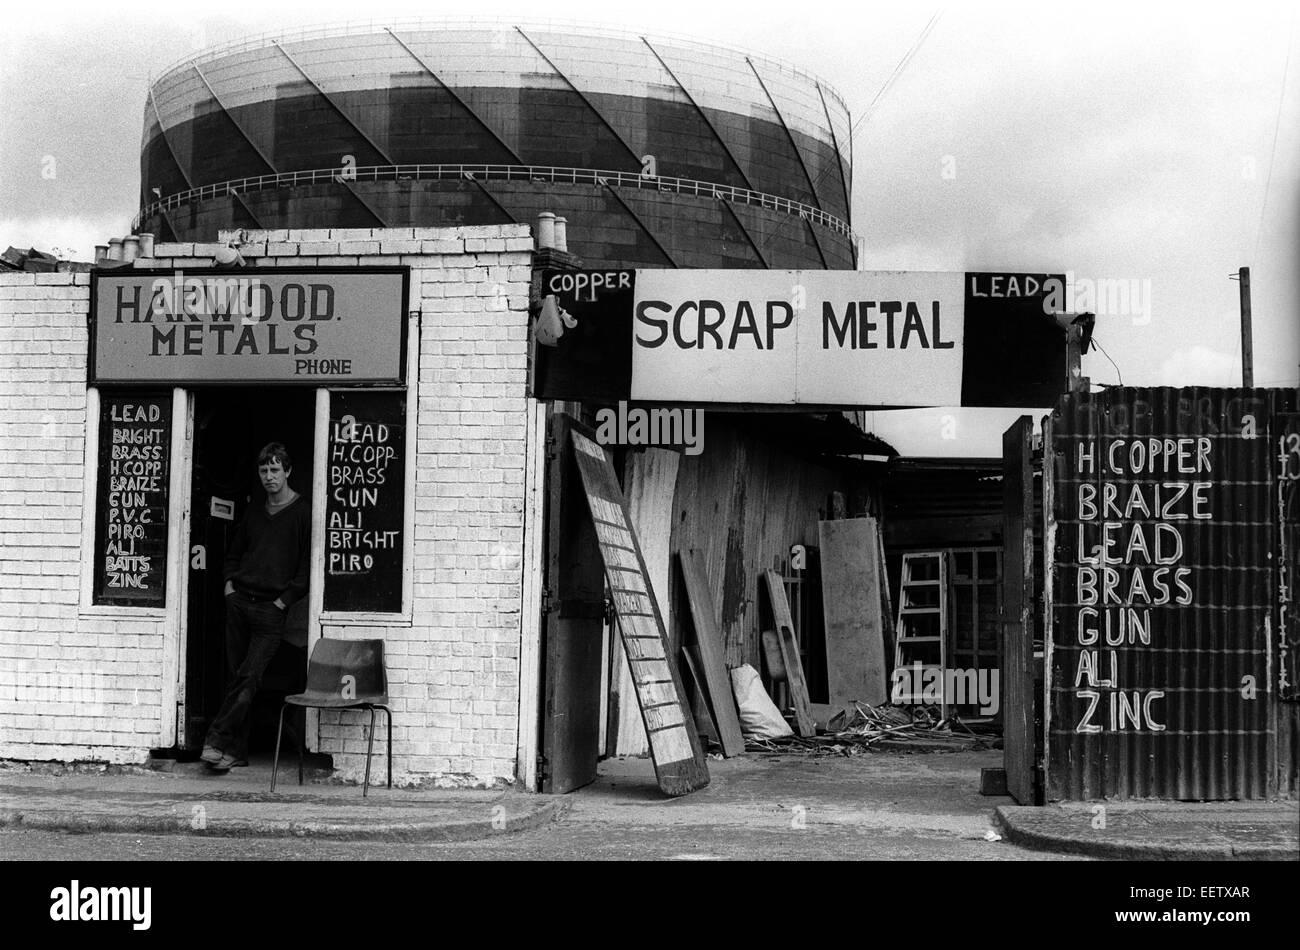 Scrap Metal shop in Deptford nr Greenwich in London in the 1970s - Stock Image